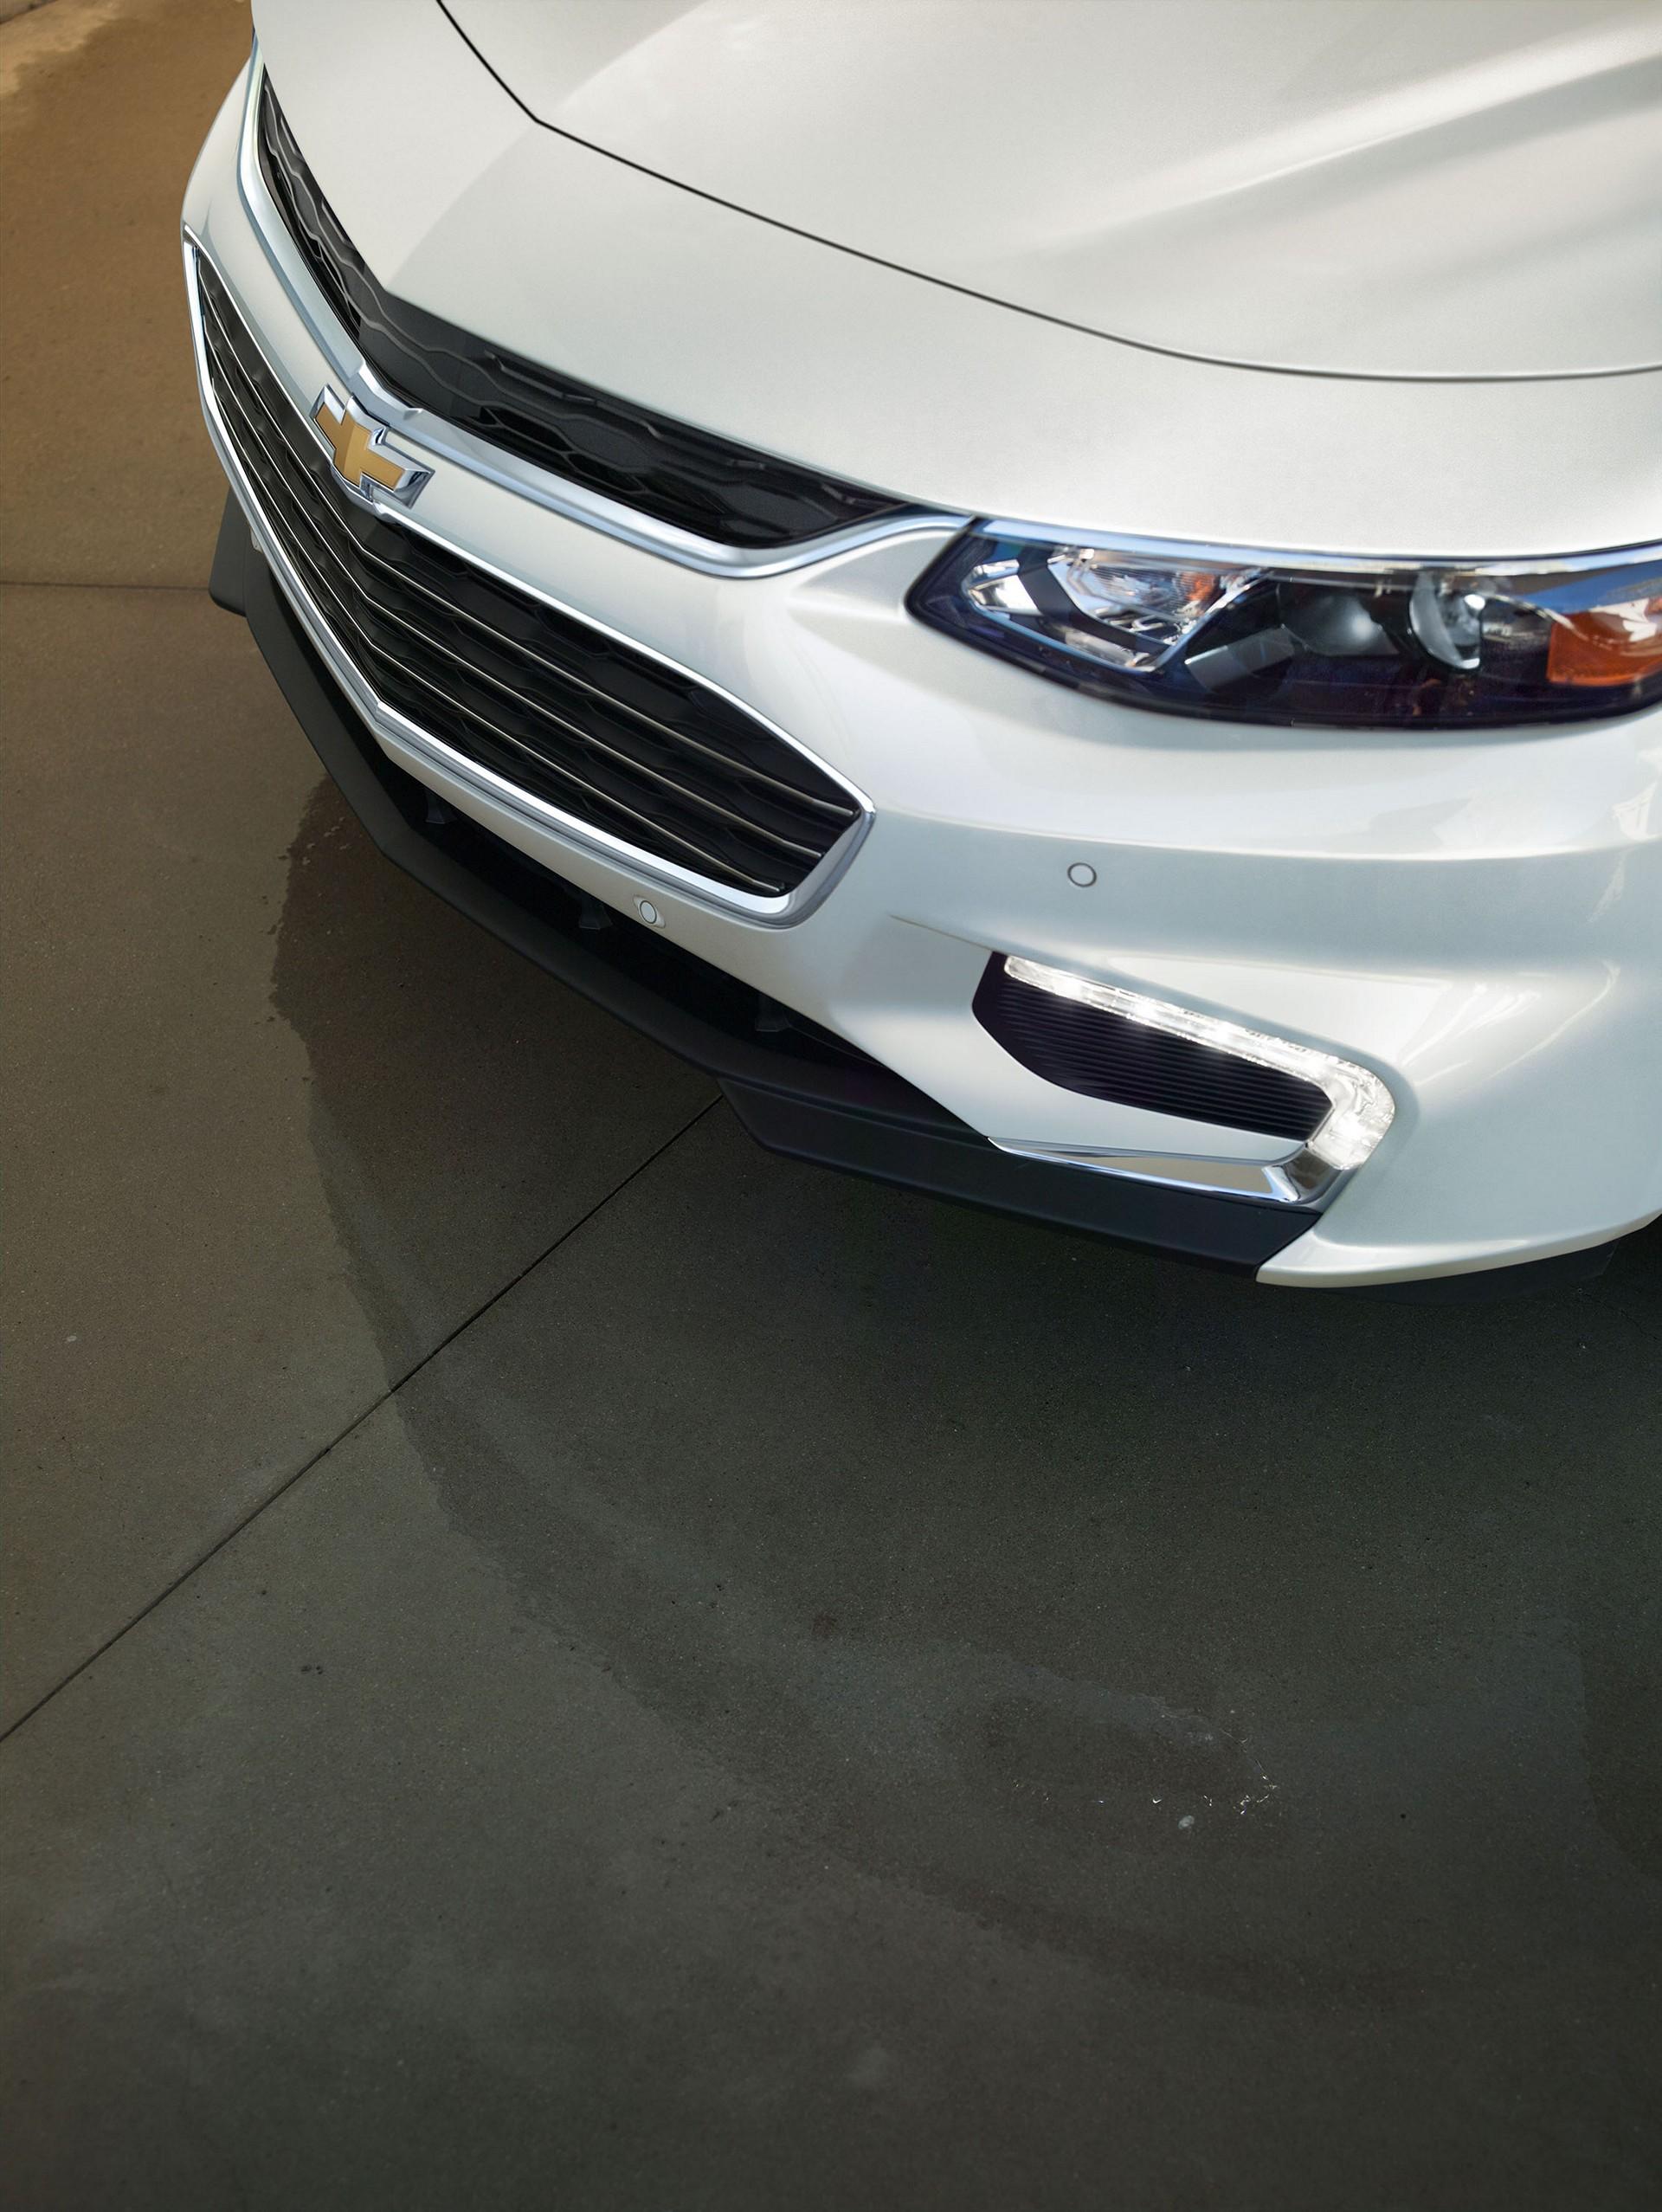 2016 Chevrolet Malibu © General Motors